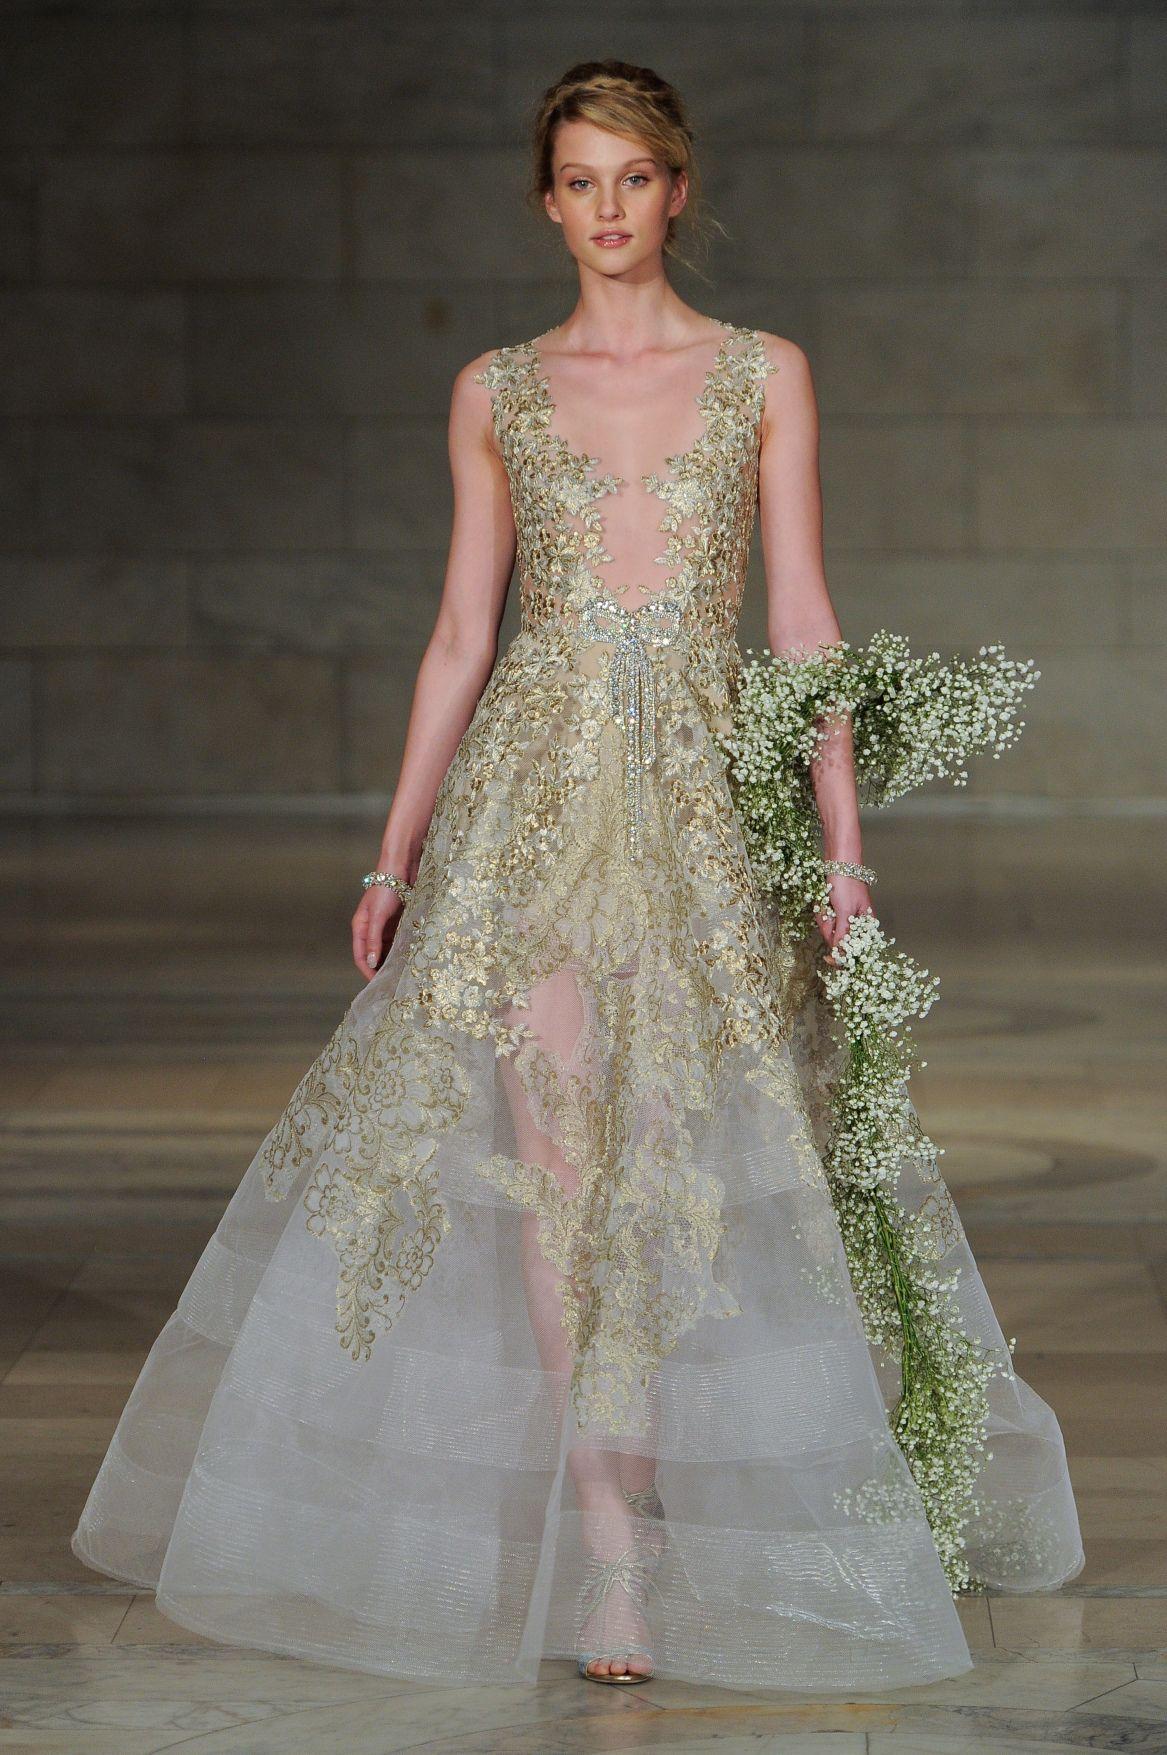 77+ Golden Wedding Dresses - Plus Size Dresses for Wedding Guest ...